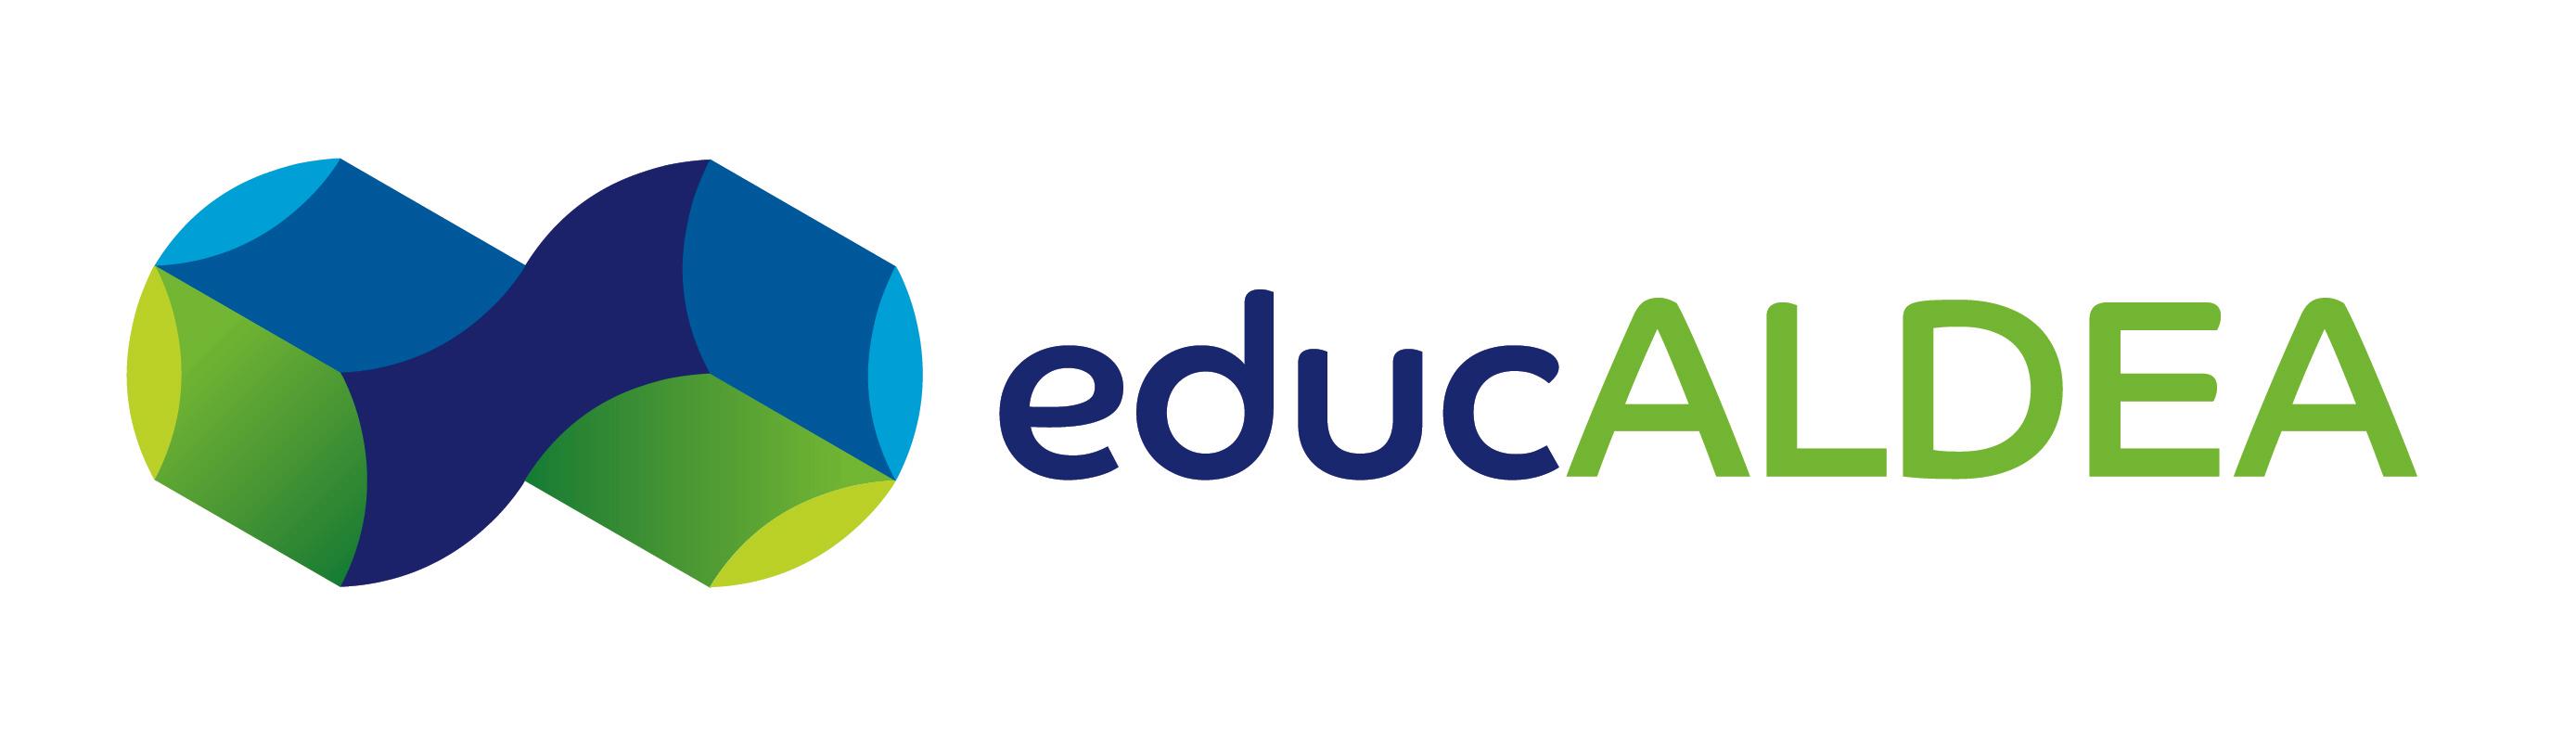 educALDEA_Color